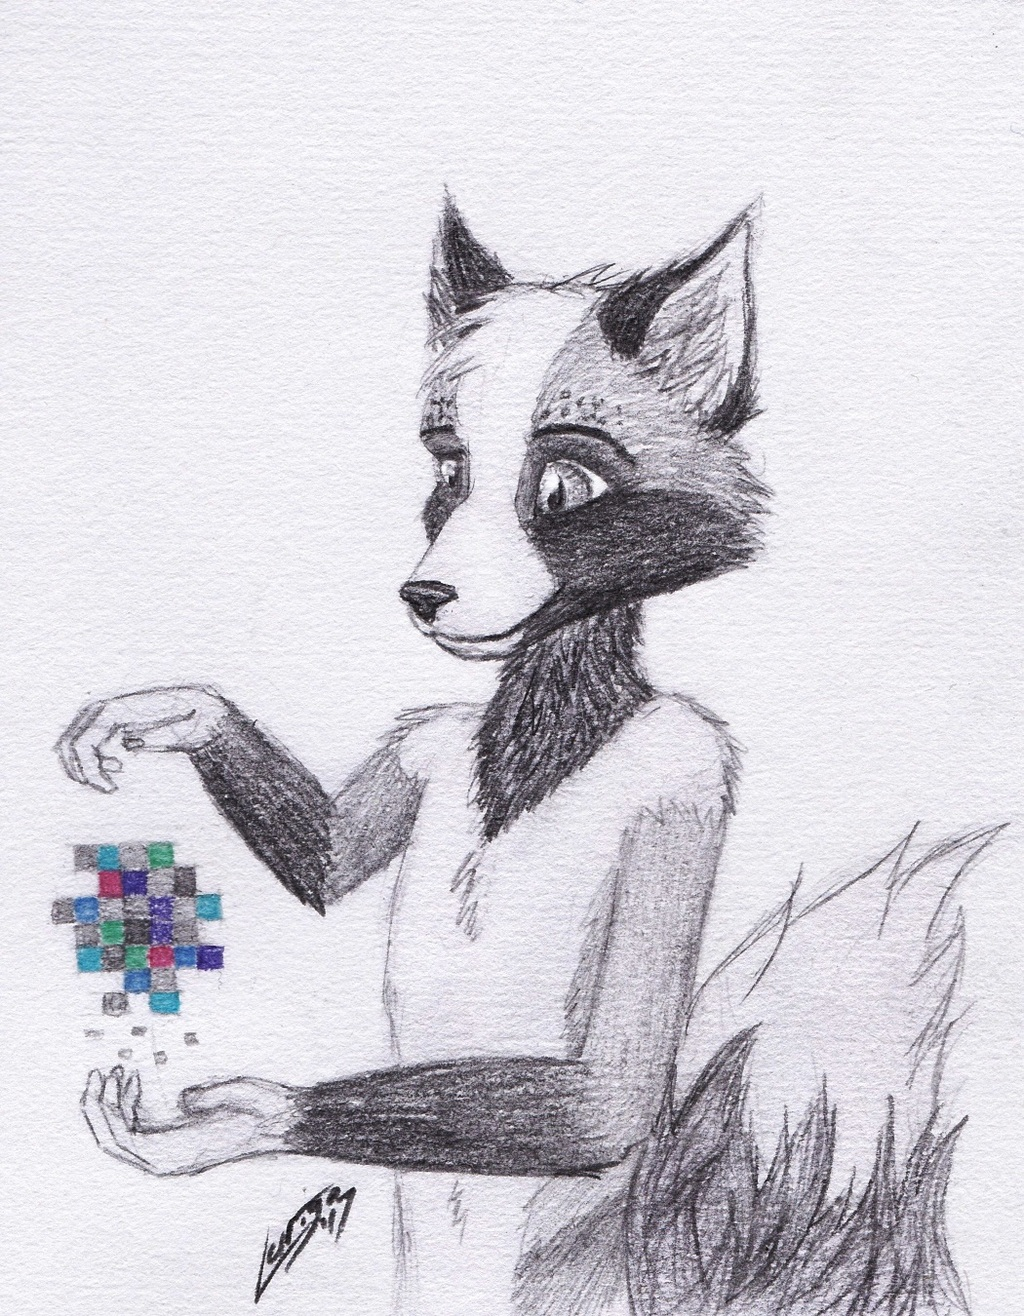 [AT] Pixelmancer (For FoxByTheFoot)